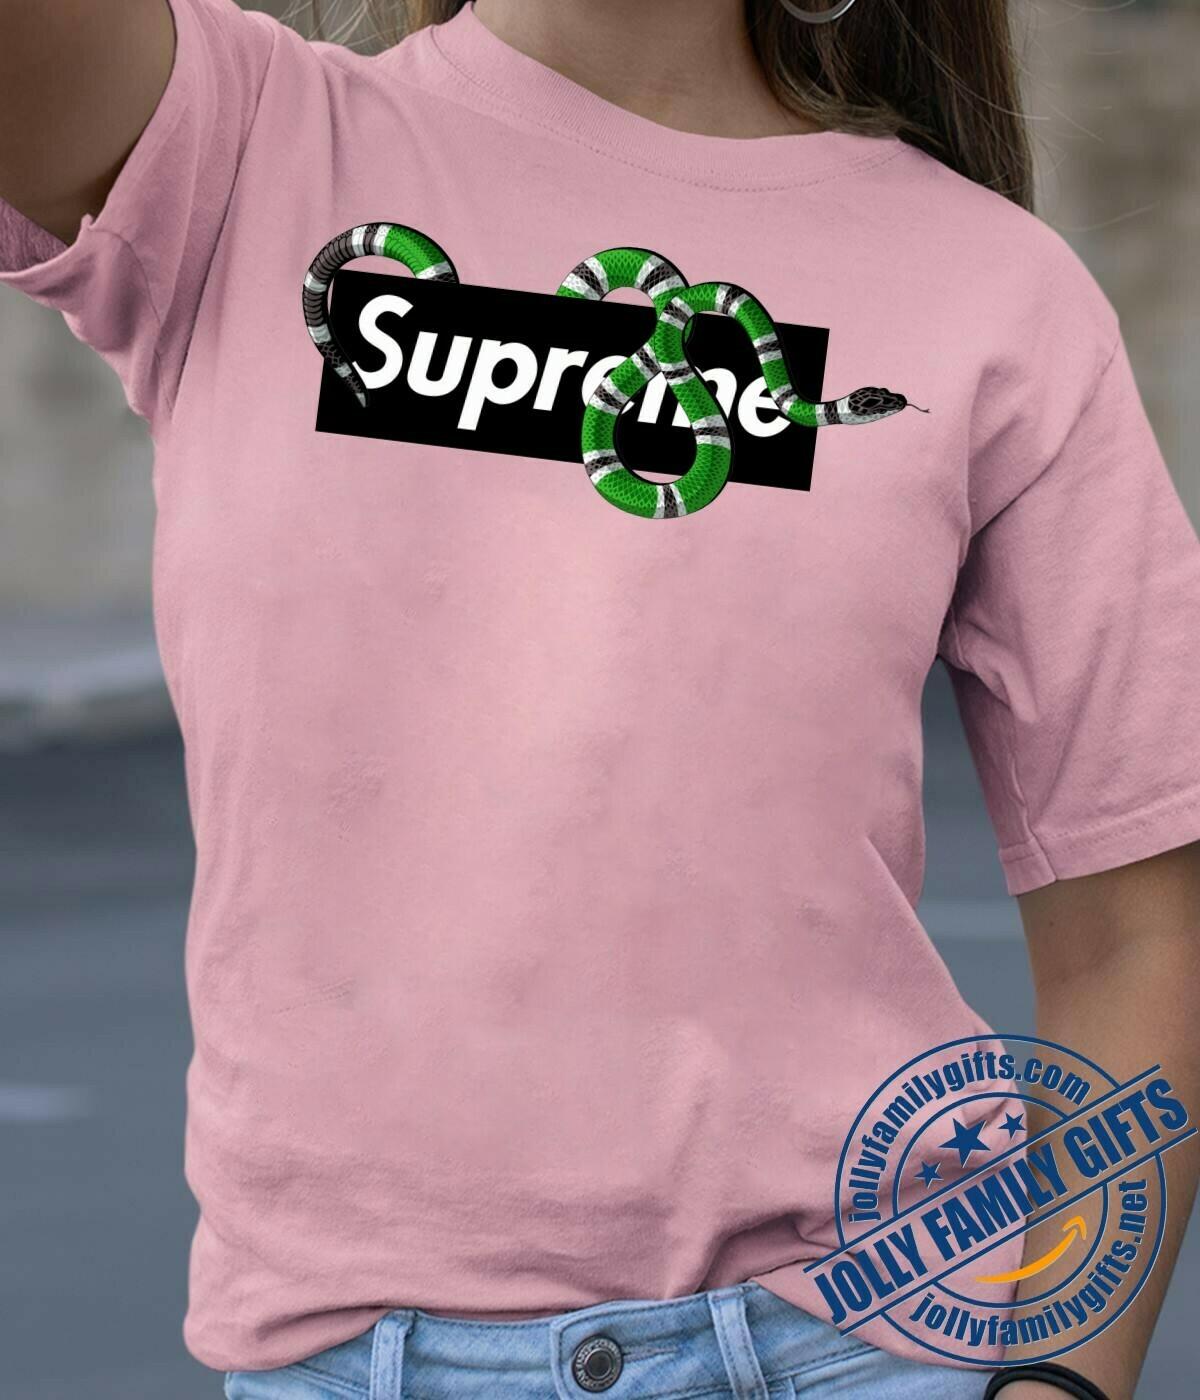 Classic Logo Snake Supreme Louis Vuitton Shirt LV T-shirt Louis Vuitton Fashion LV Fashion Shirts for Women Men Vintage  Unisex T-Shirt Hoodie Sweatshirt Sweater for Ladies Women Men Kids Youth Gifts